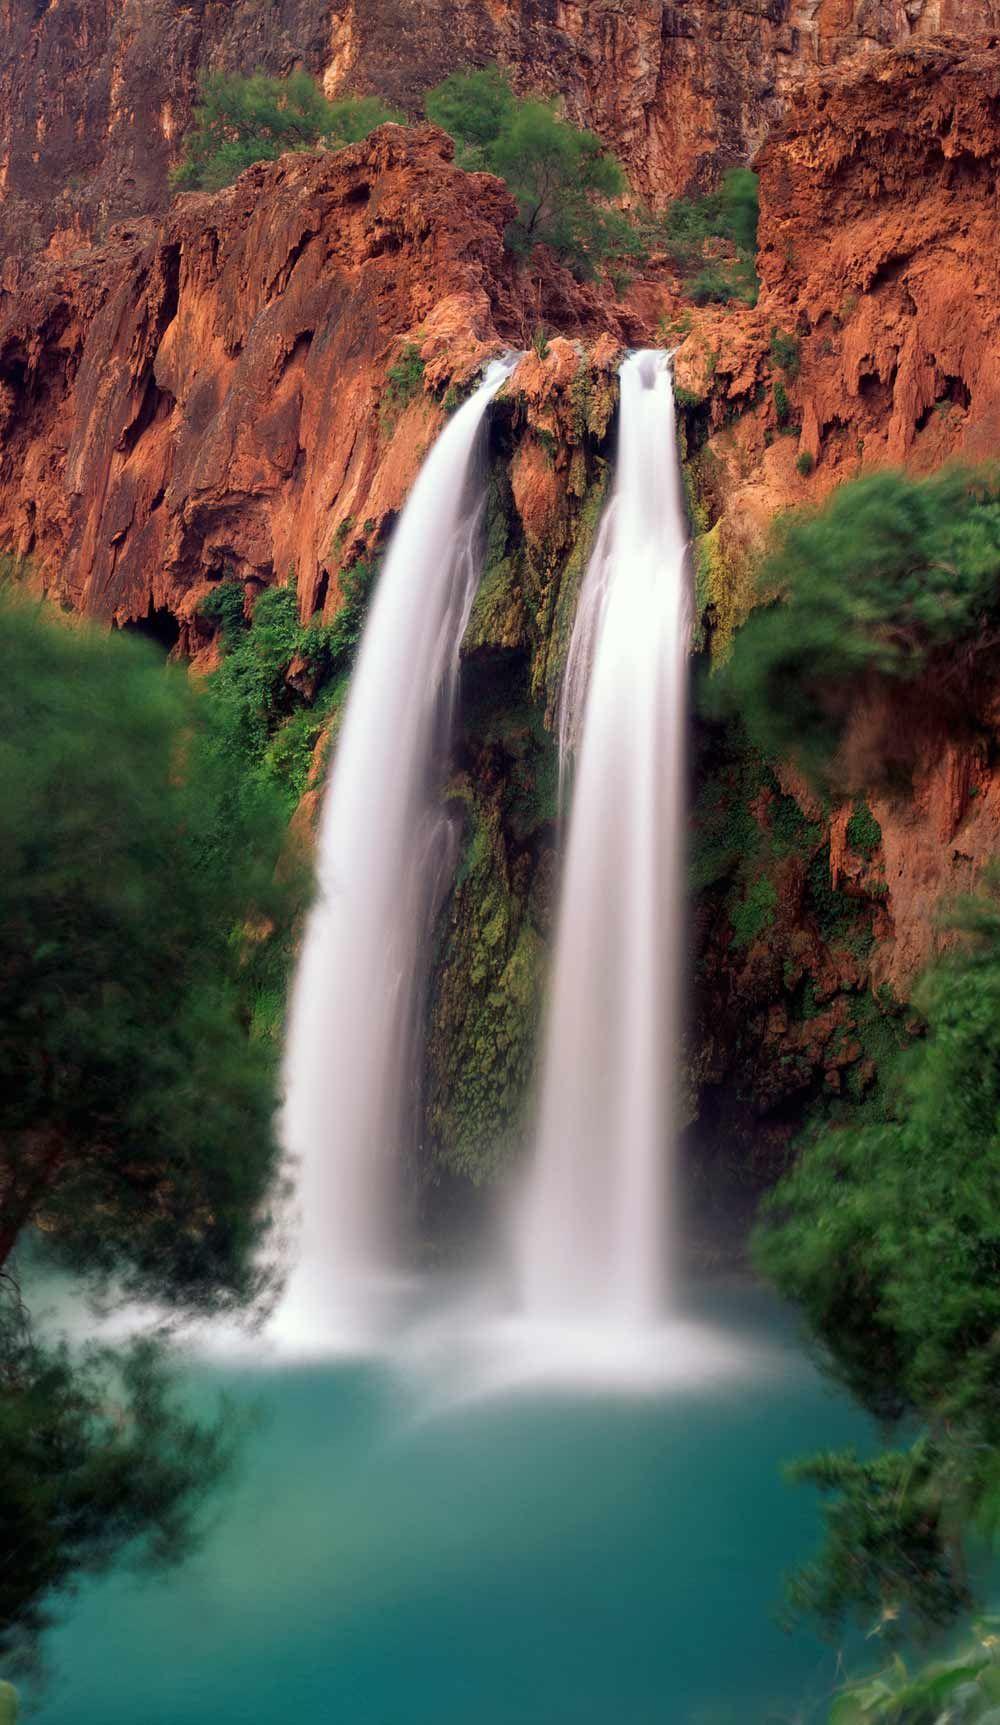 Stati Uniti, Arizona